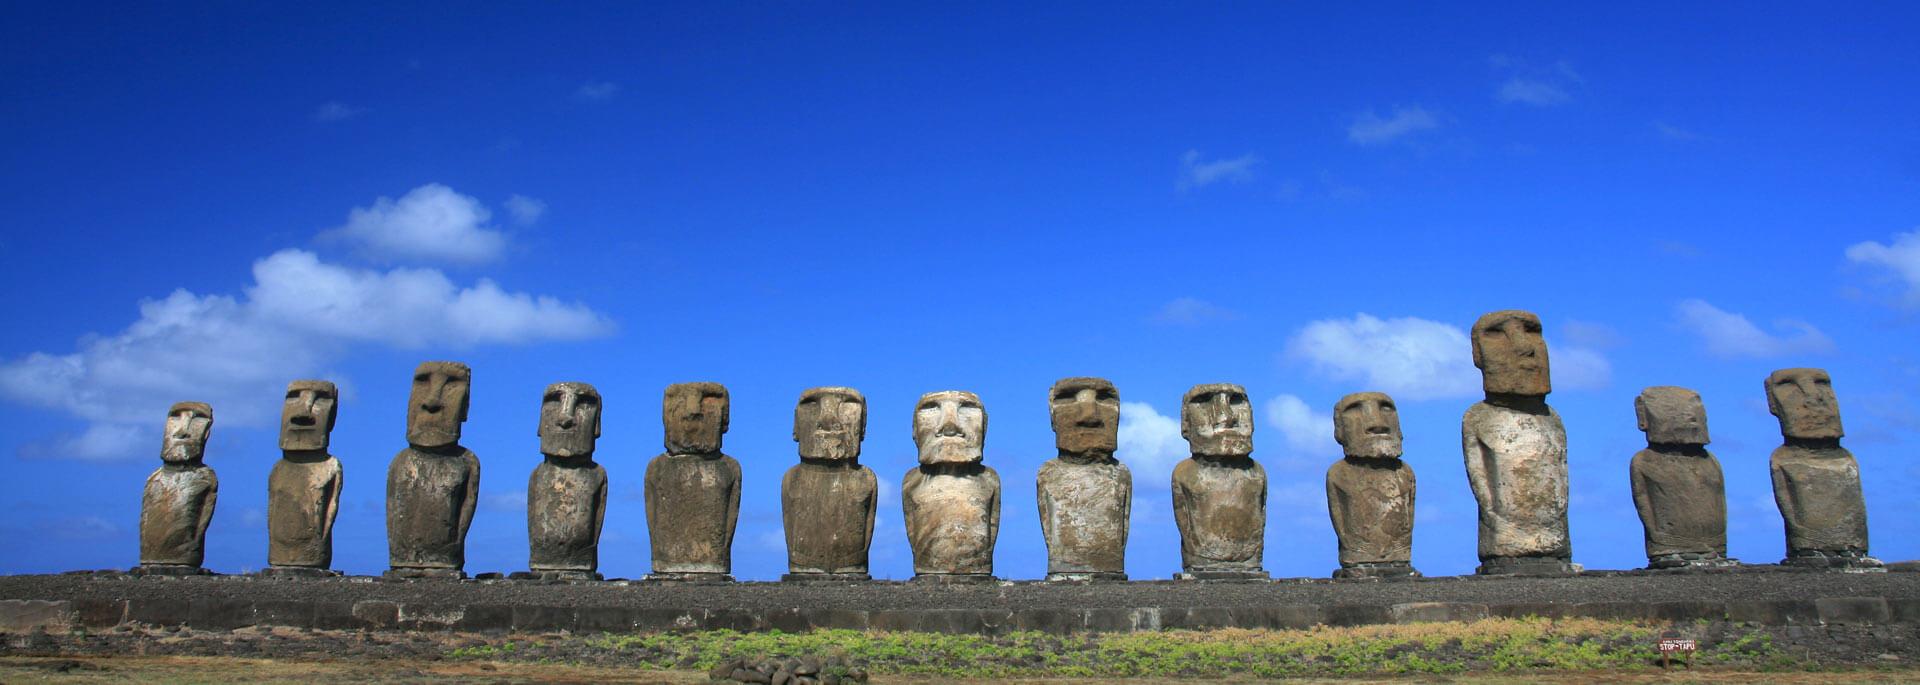 Fotos: Osterinsel / Rapa Nui